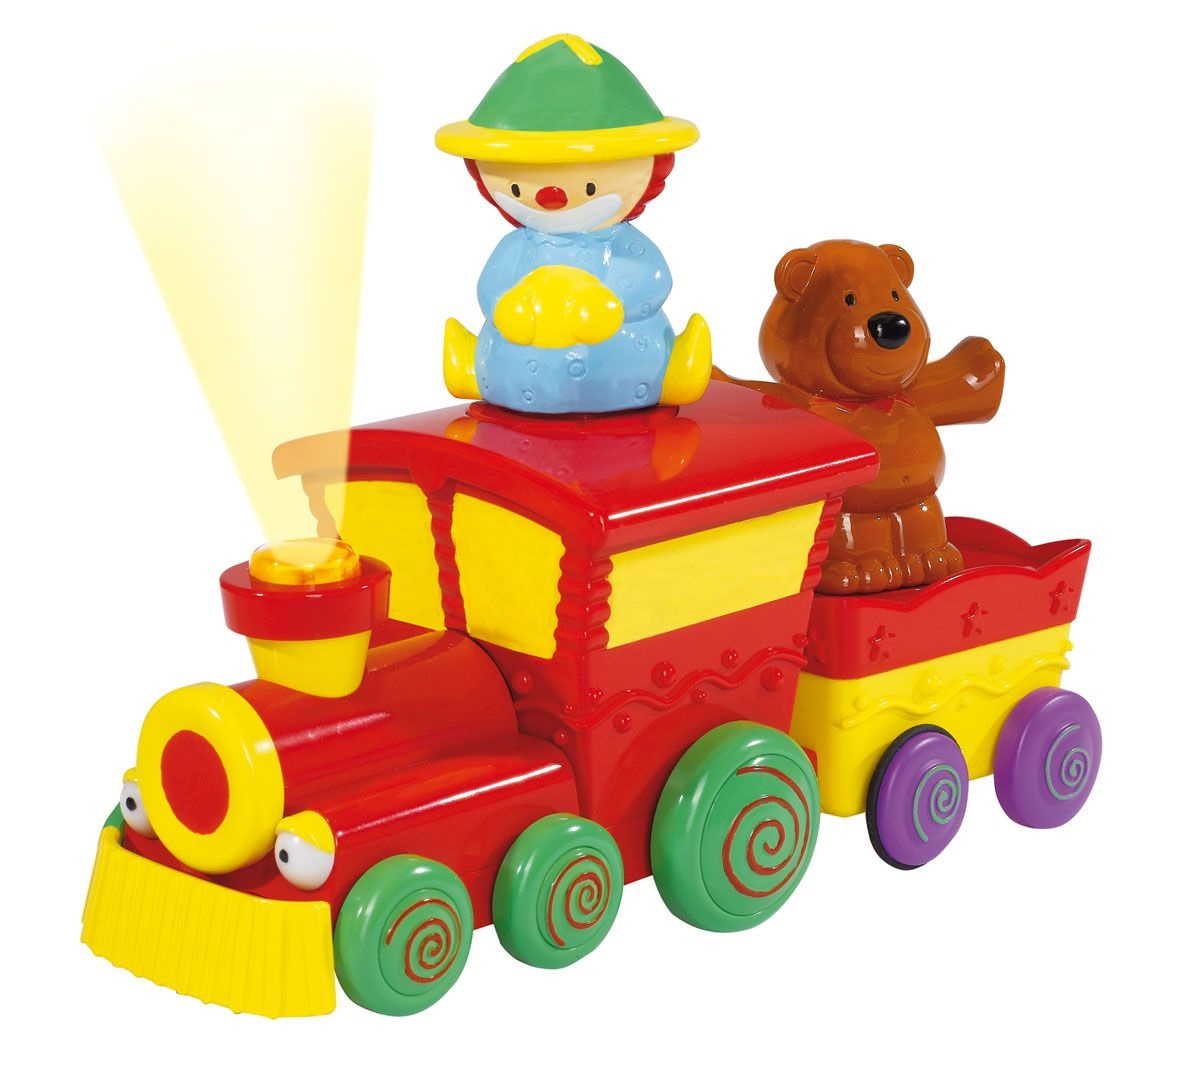 Паровозик - Железная дорога для малышей, артикул: 11956